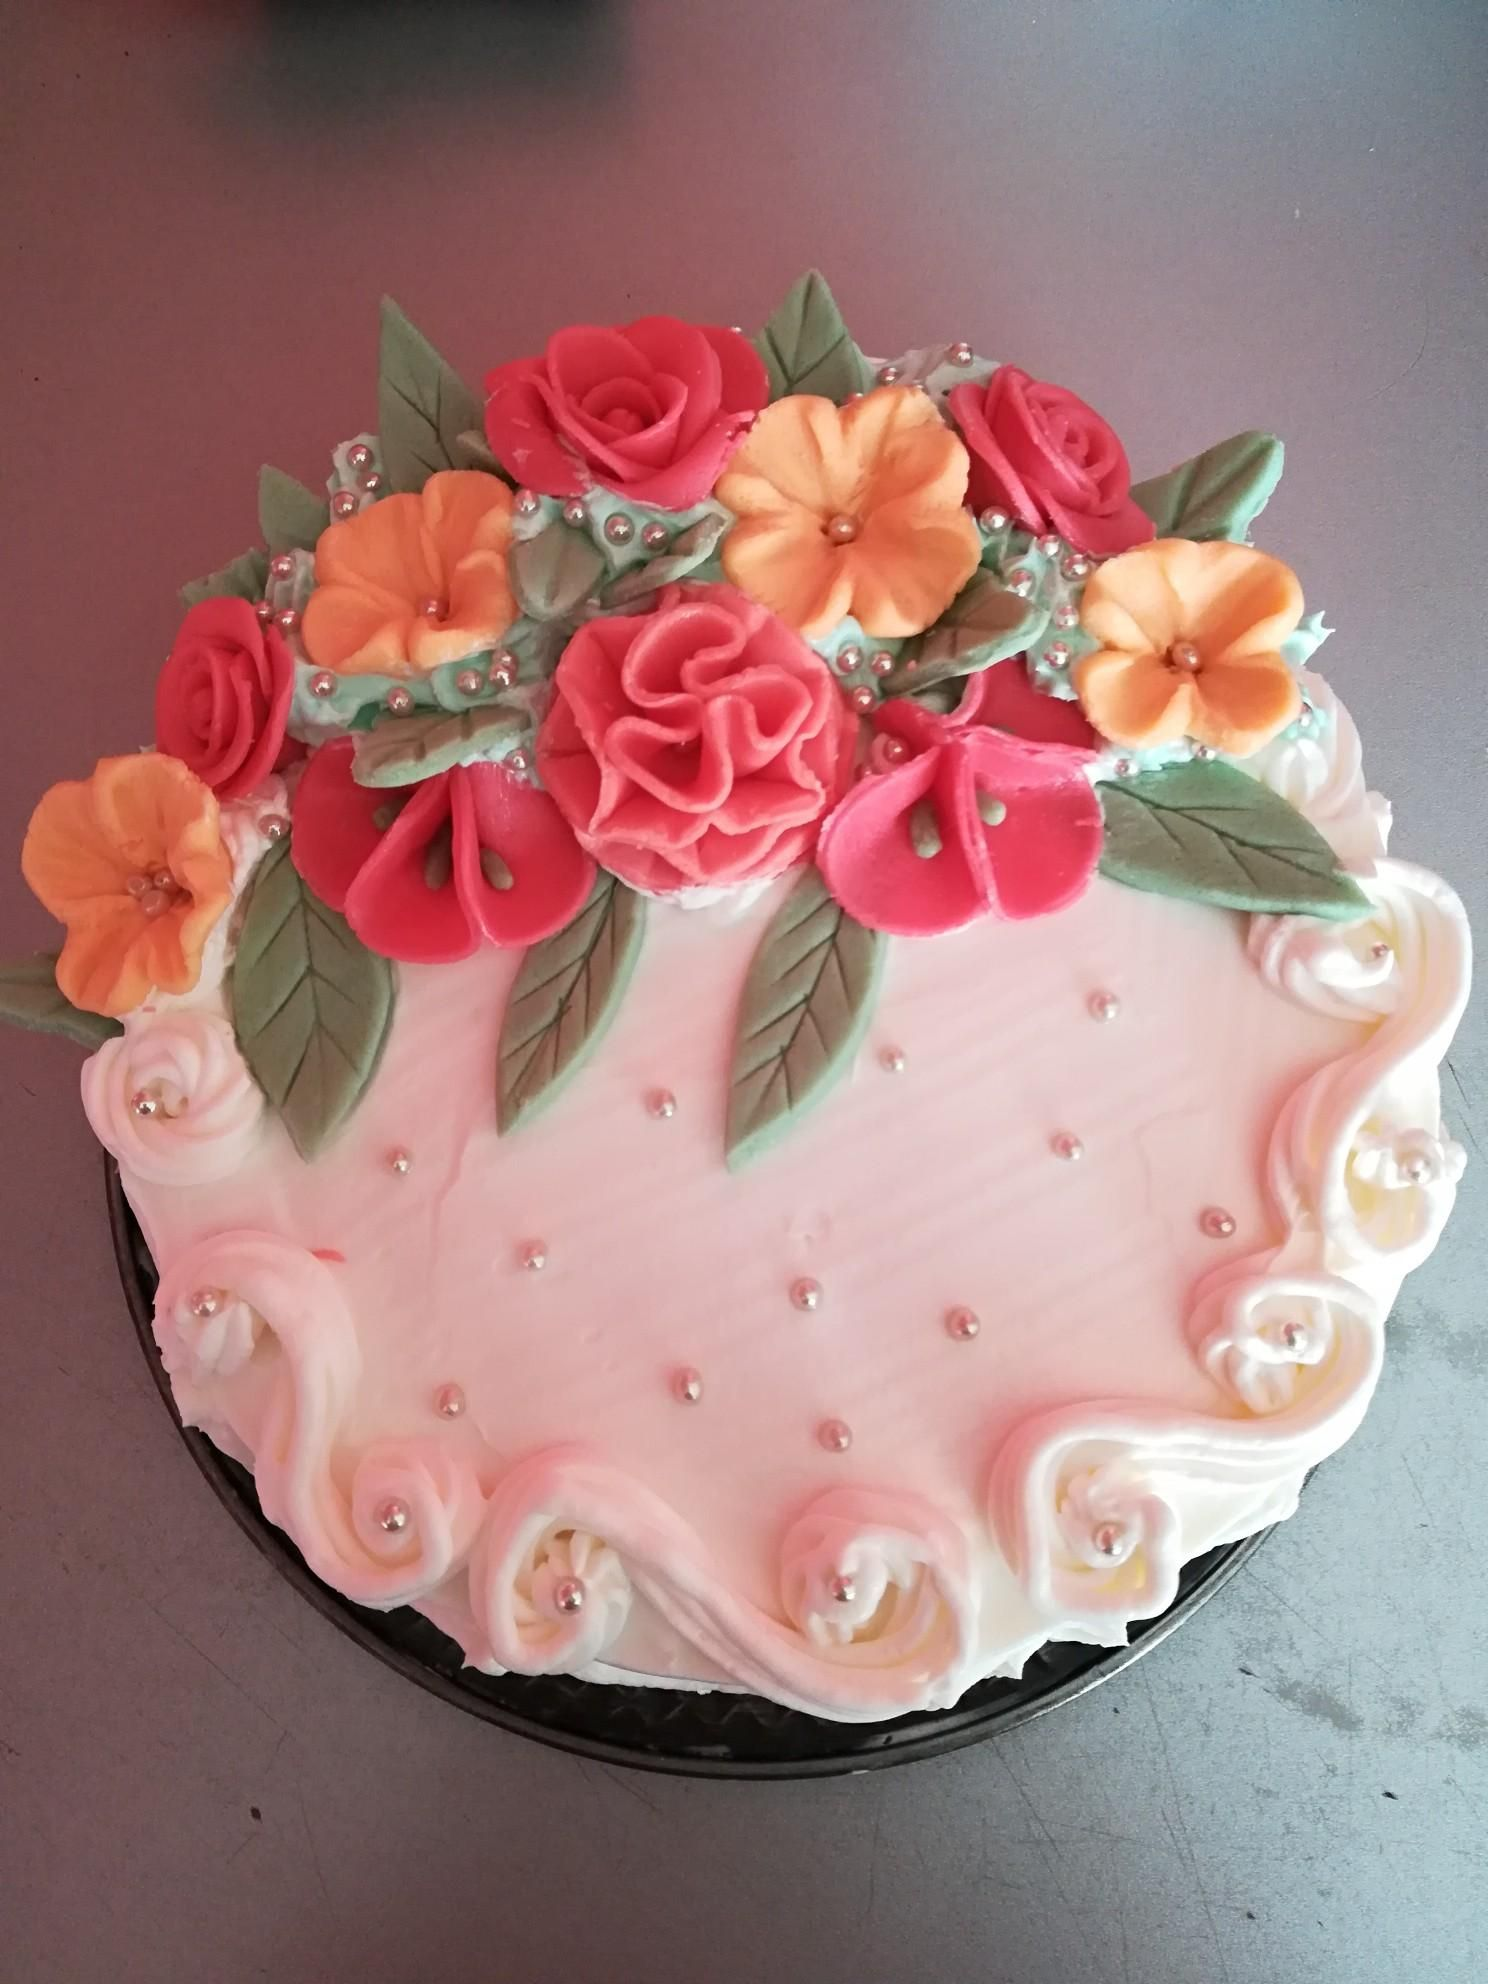 Pastel De 3 Leches Mi Primer Pastel De 3 Leches Con Flores De Malvaviscos Recetasfaciles Recetasgratis Foodideas Recetasdelici Cake Designs Cake Desserts